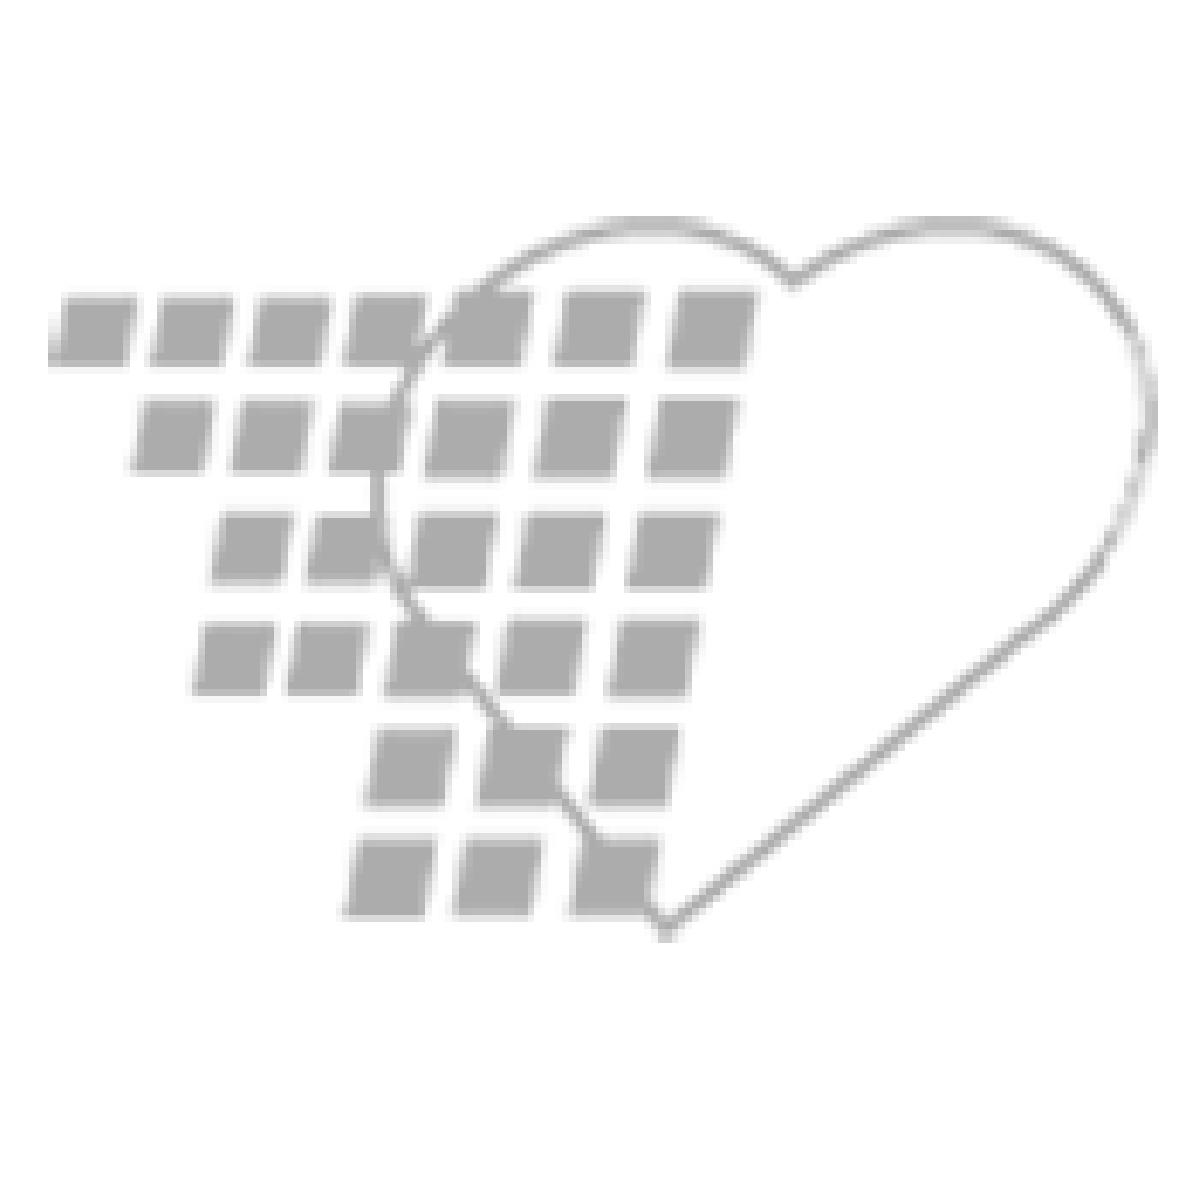 03-04-8224 PURELL™ Advanced Hand Sanitizer Aloe Gel 2oz Bottle - (ships ORMD)